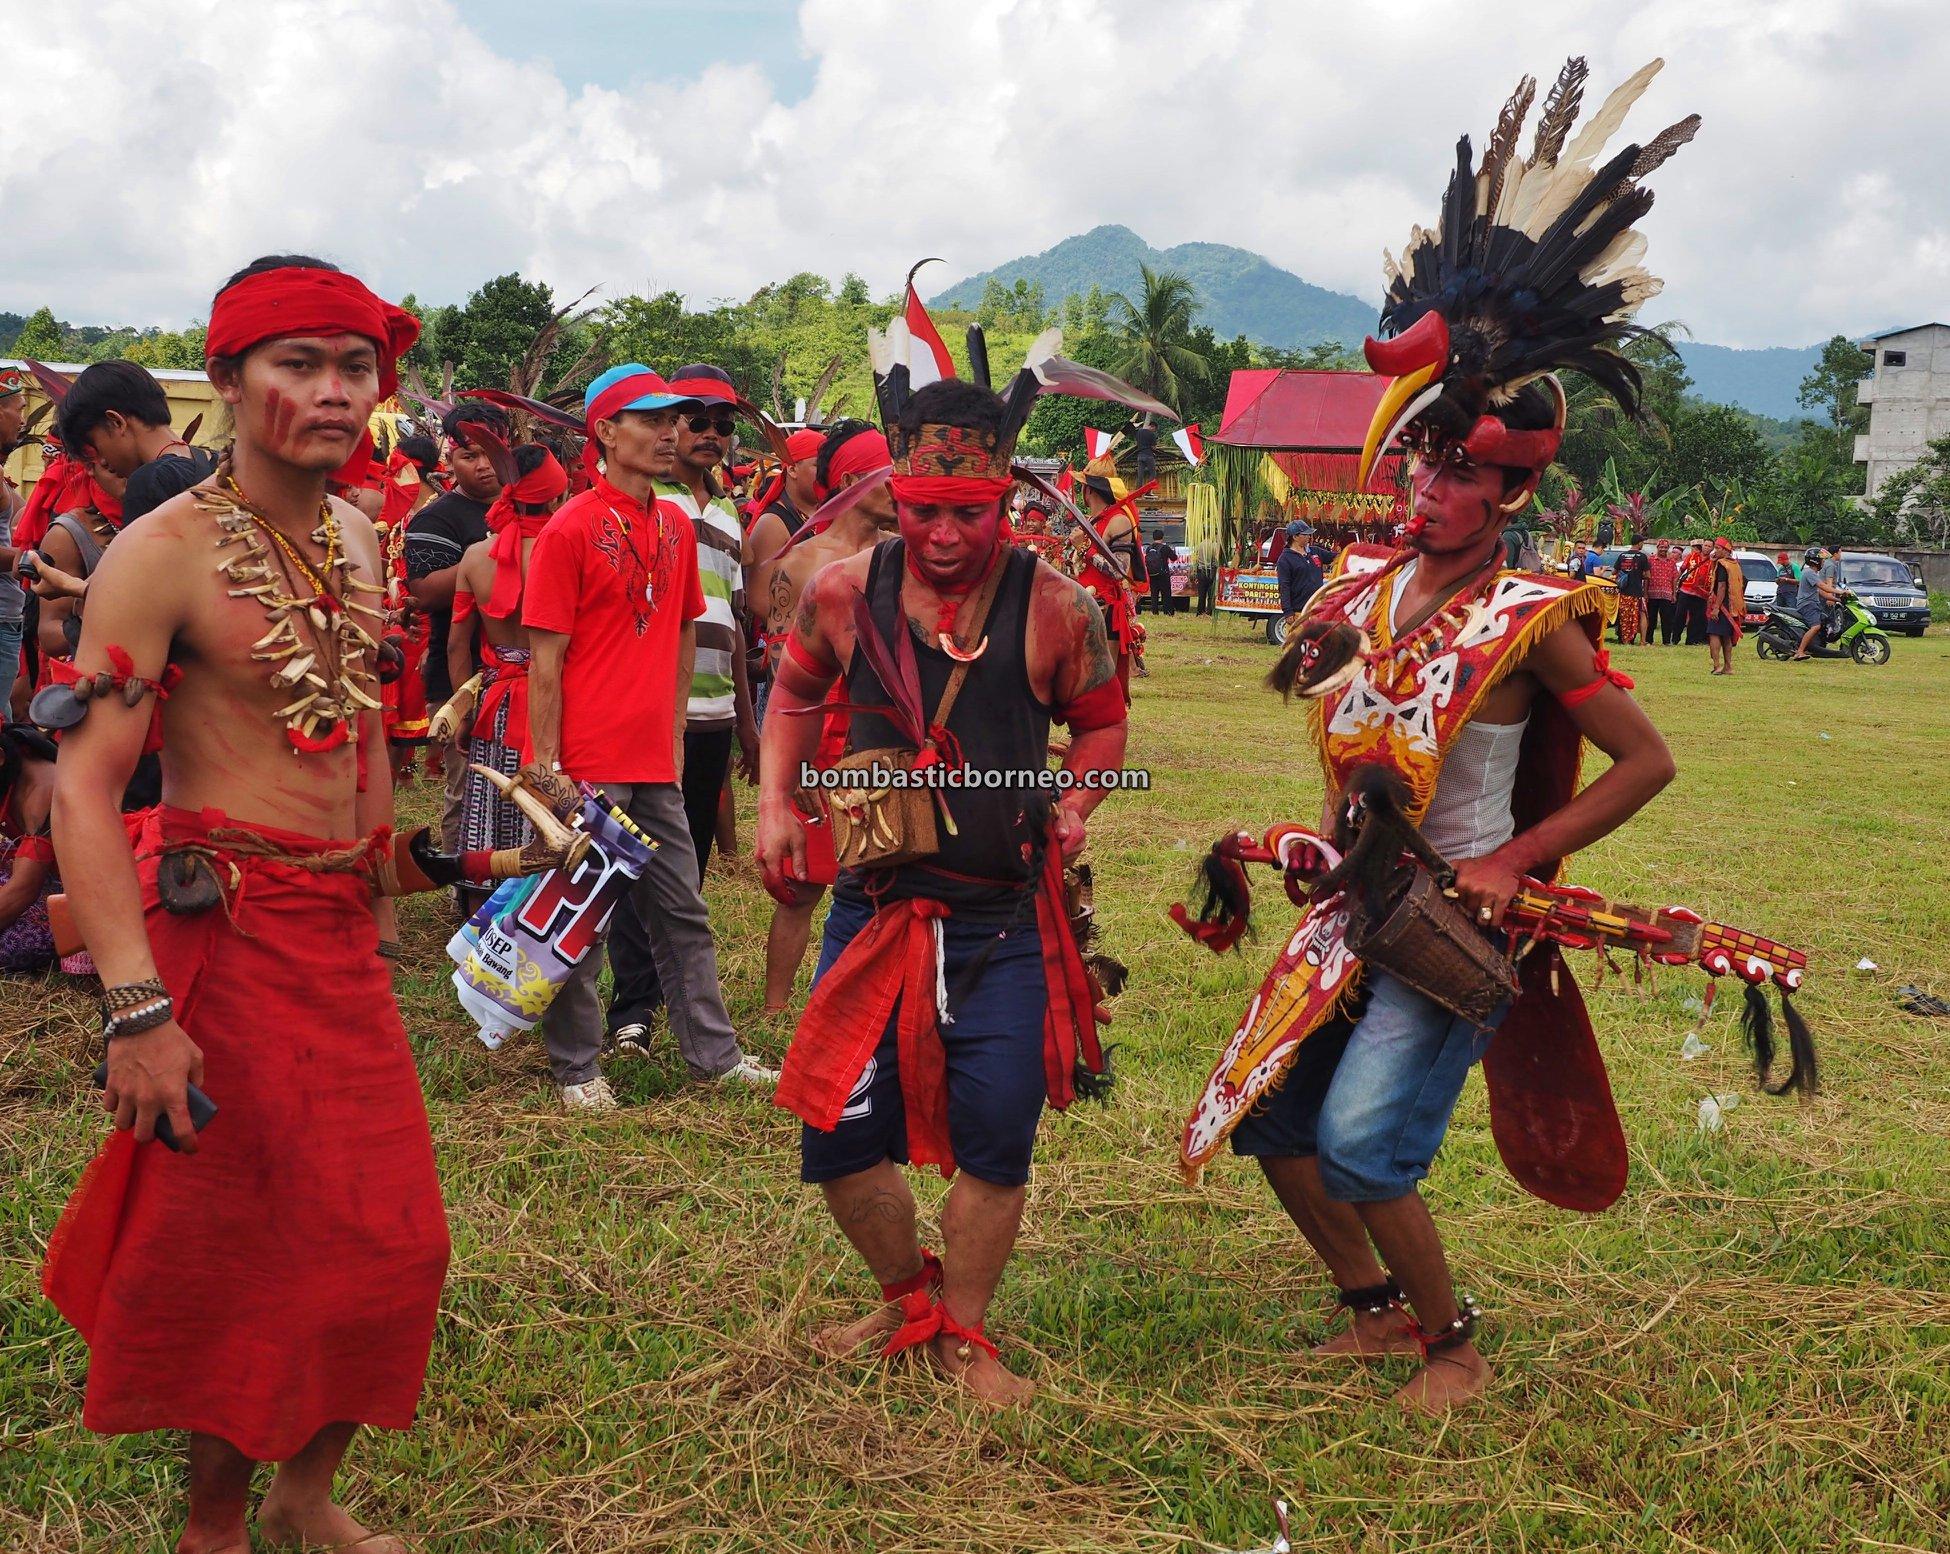 Festival Budaya Dayak, indigenous, traditional, event, tribal, Kalimantan Barat, destination, Obyek wisata, Tourism, travel guide, Cross Border, Borneo, 探索婆罗洲游踪, 印尼西加里曼丹, 孟加映达雅传统文化